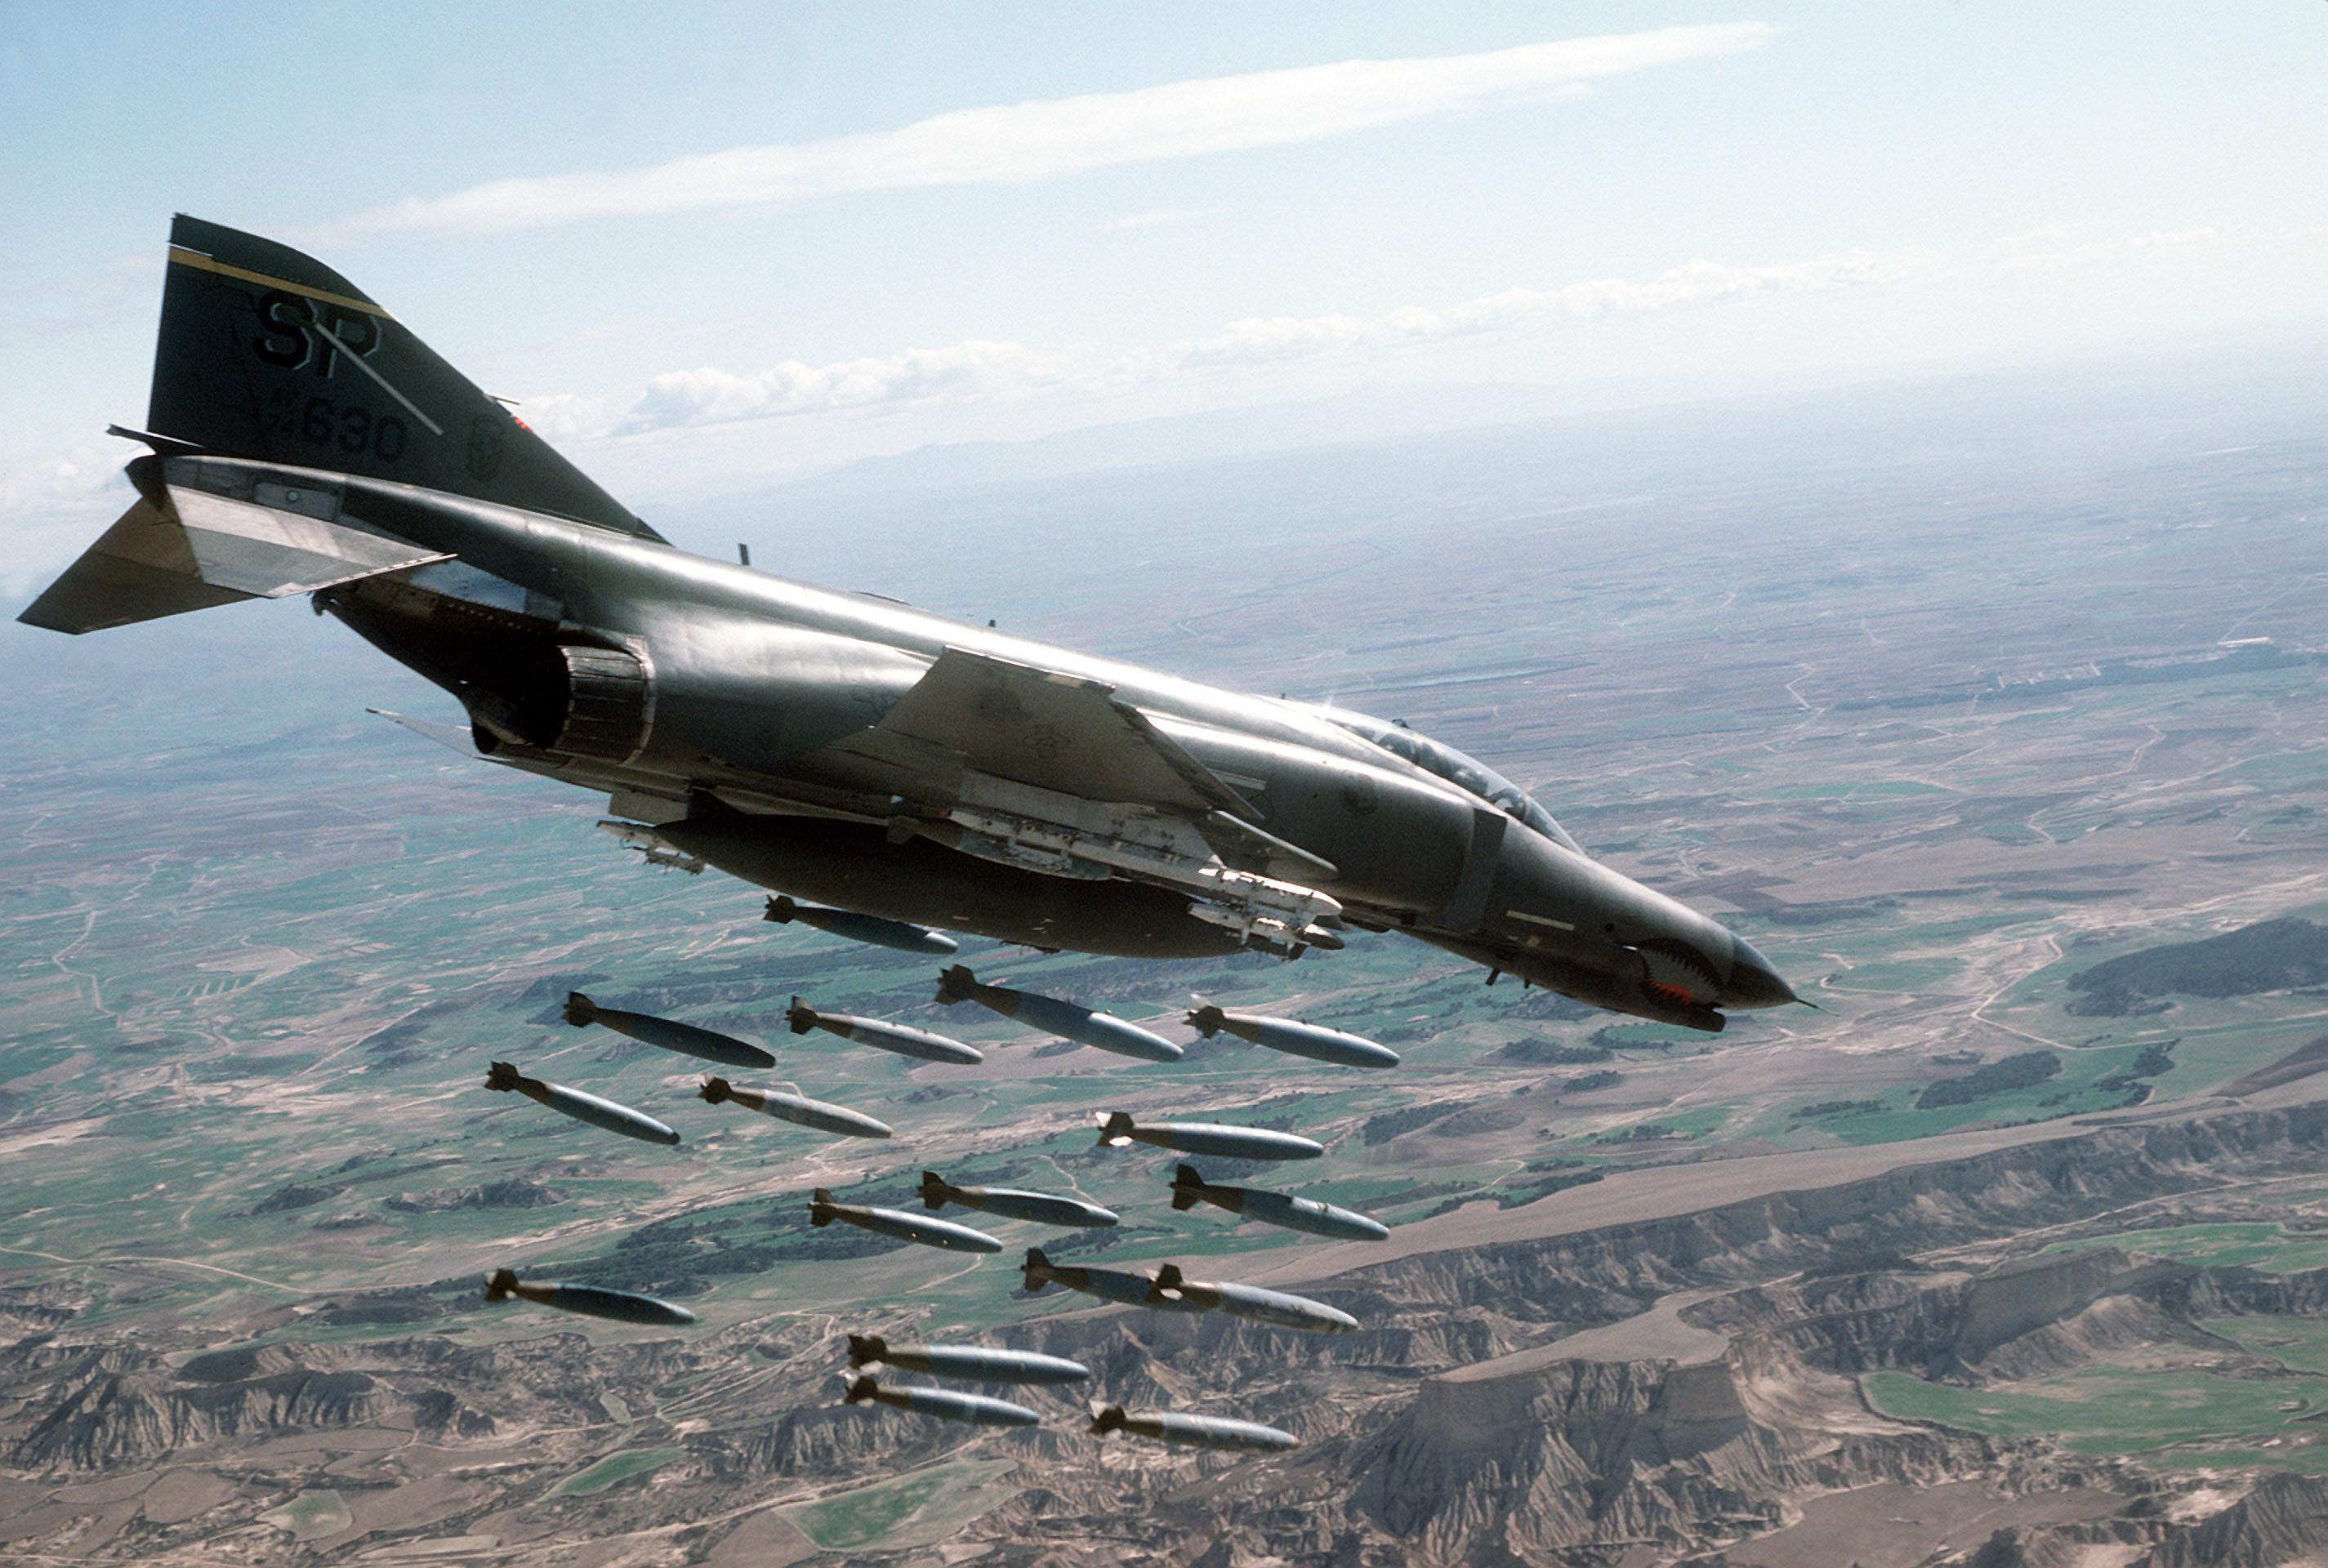 39865_aircraft_military_airplane.jpg